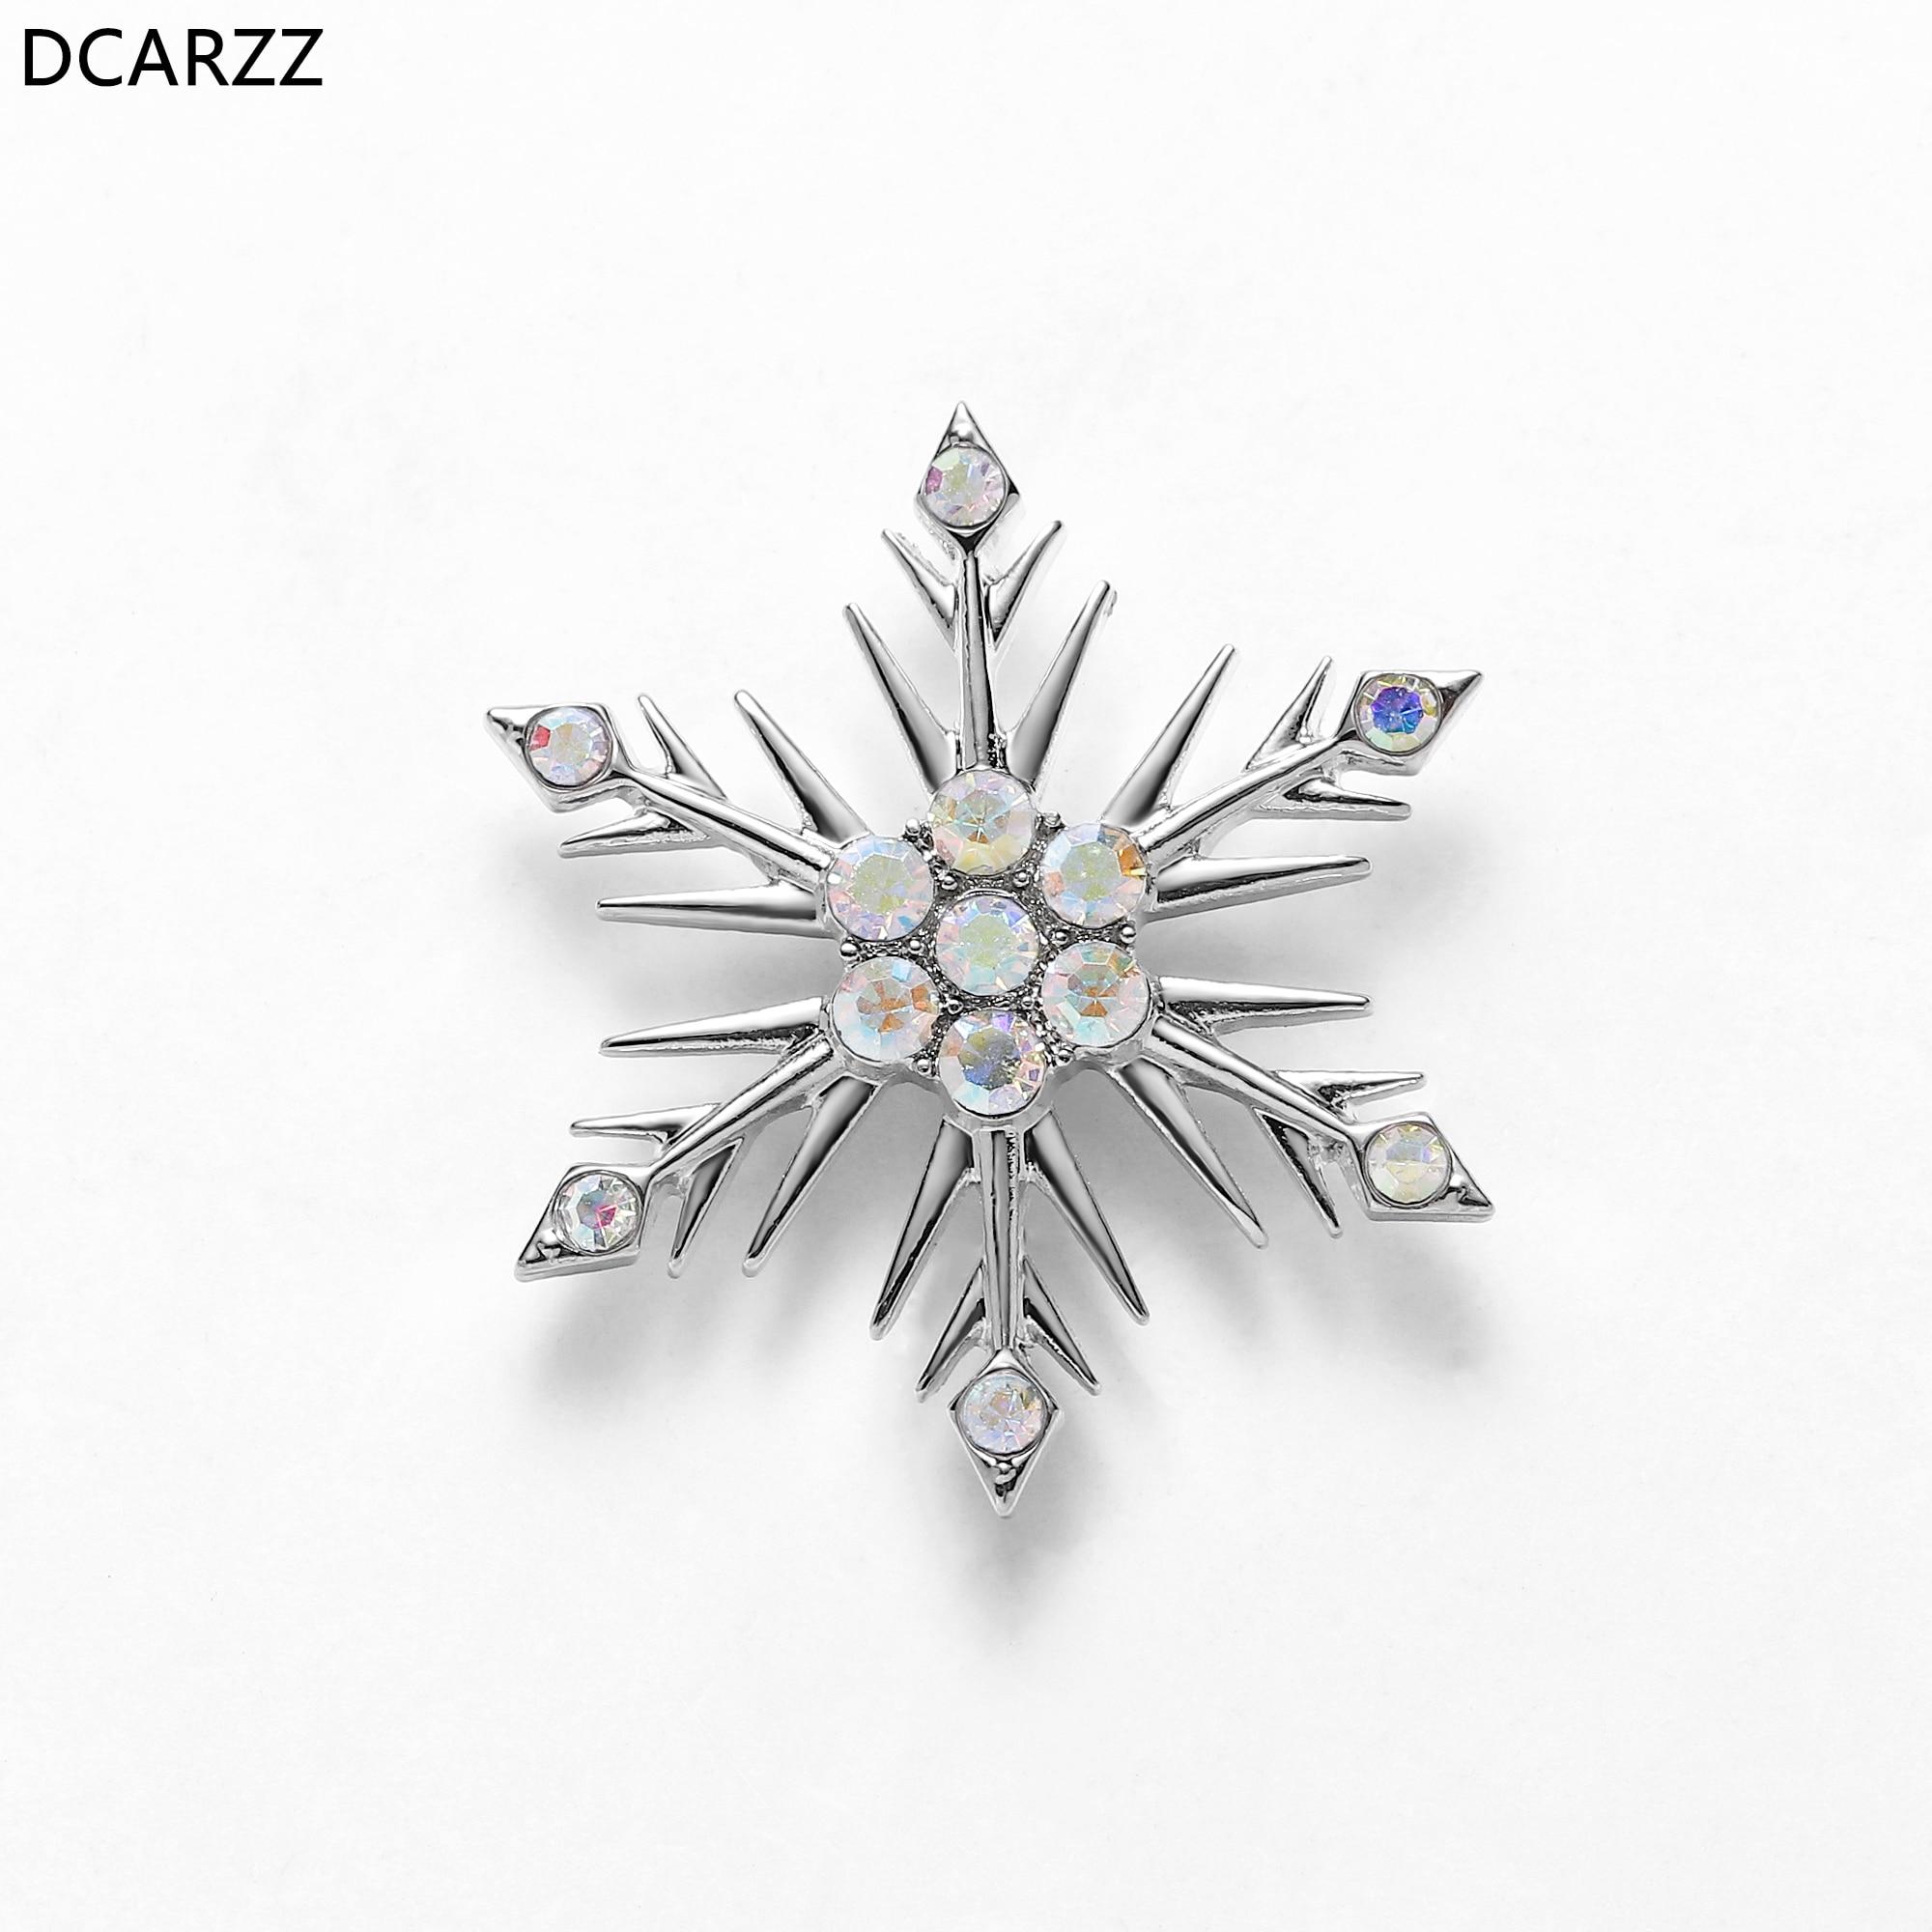 Crystals Snowflake Rhinestone Pin Princess Elsa Anna Brooch Girls Lapel Jewelry Christmas Gift Coat Accessories Corsage Pins